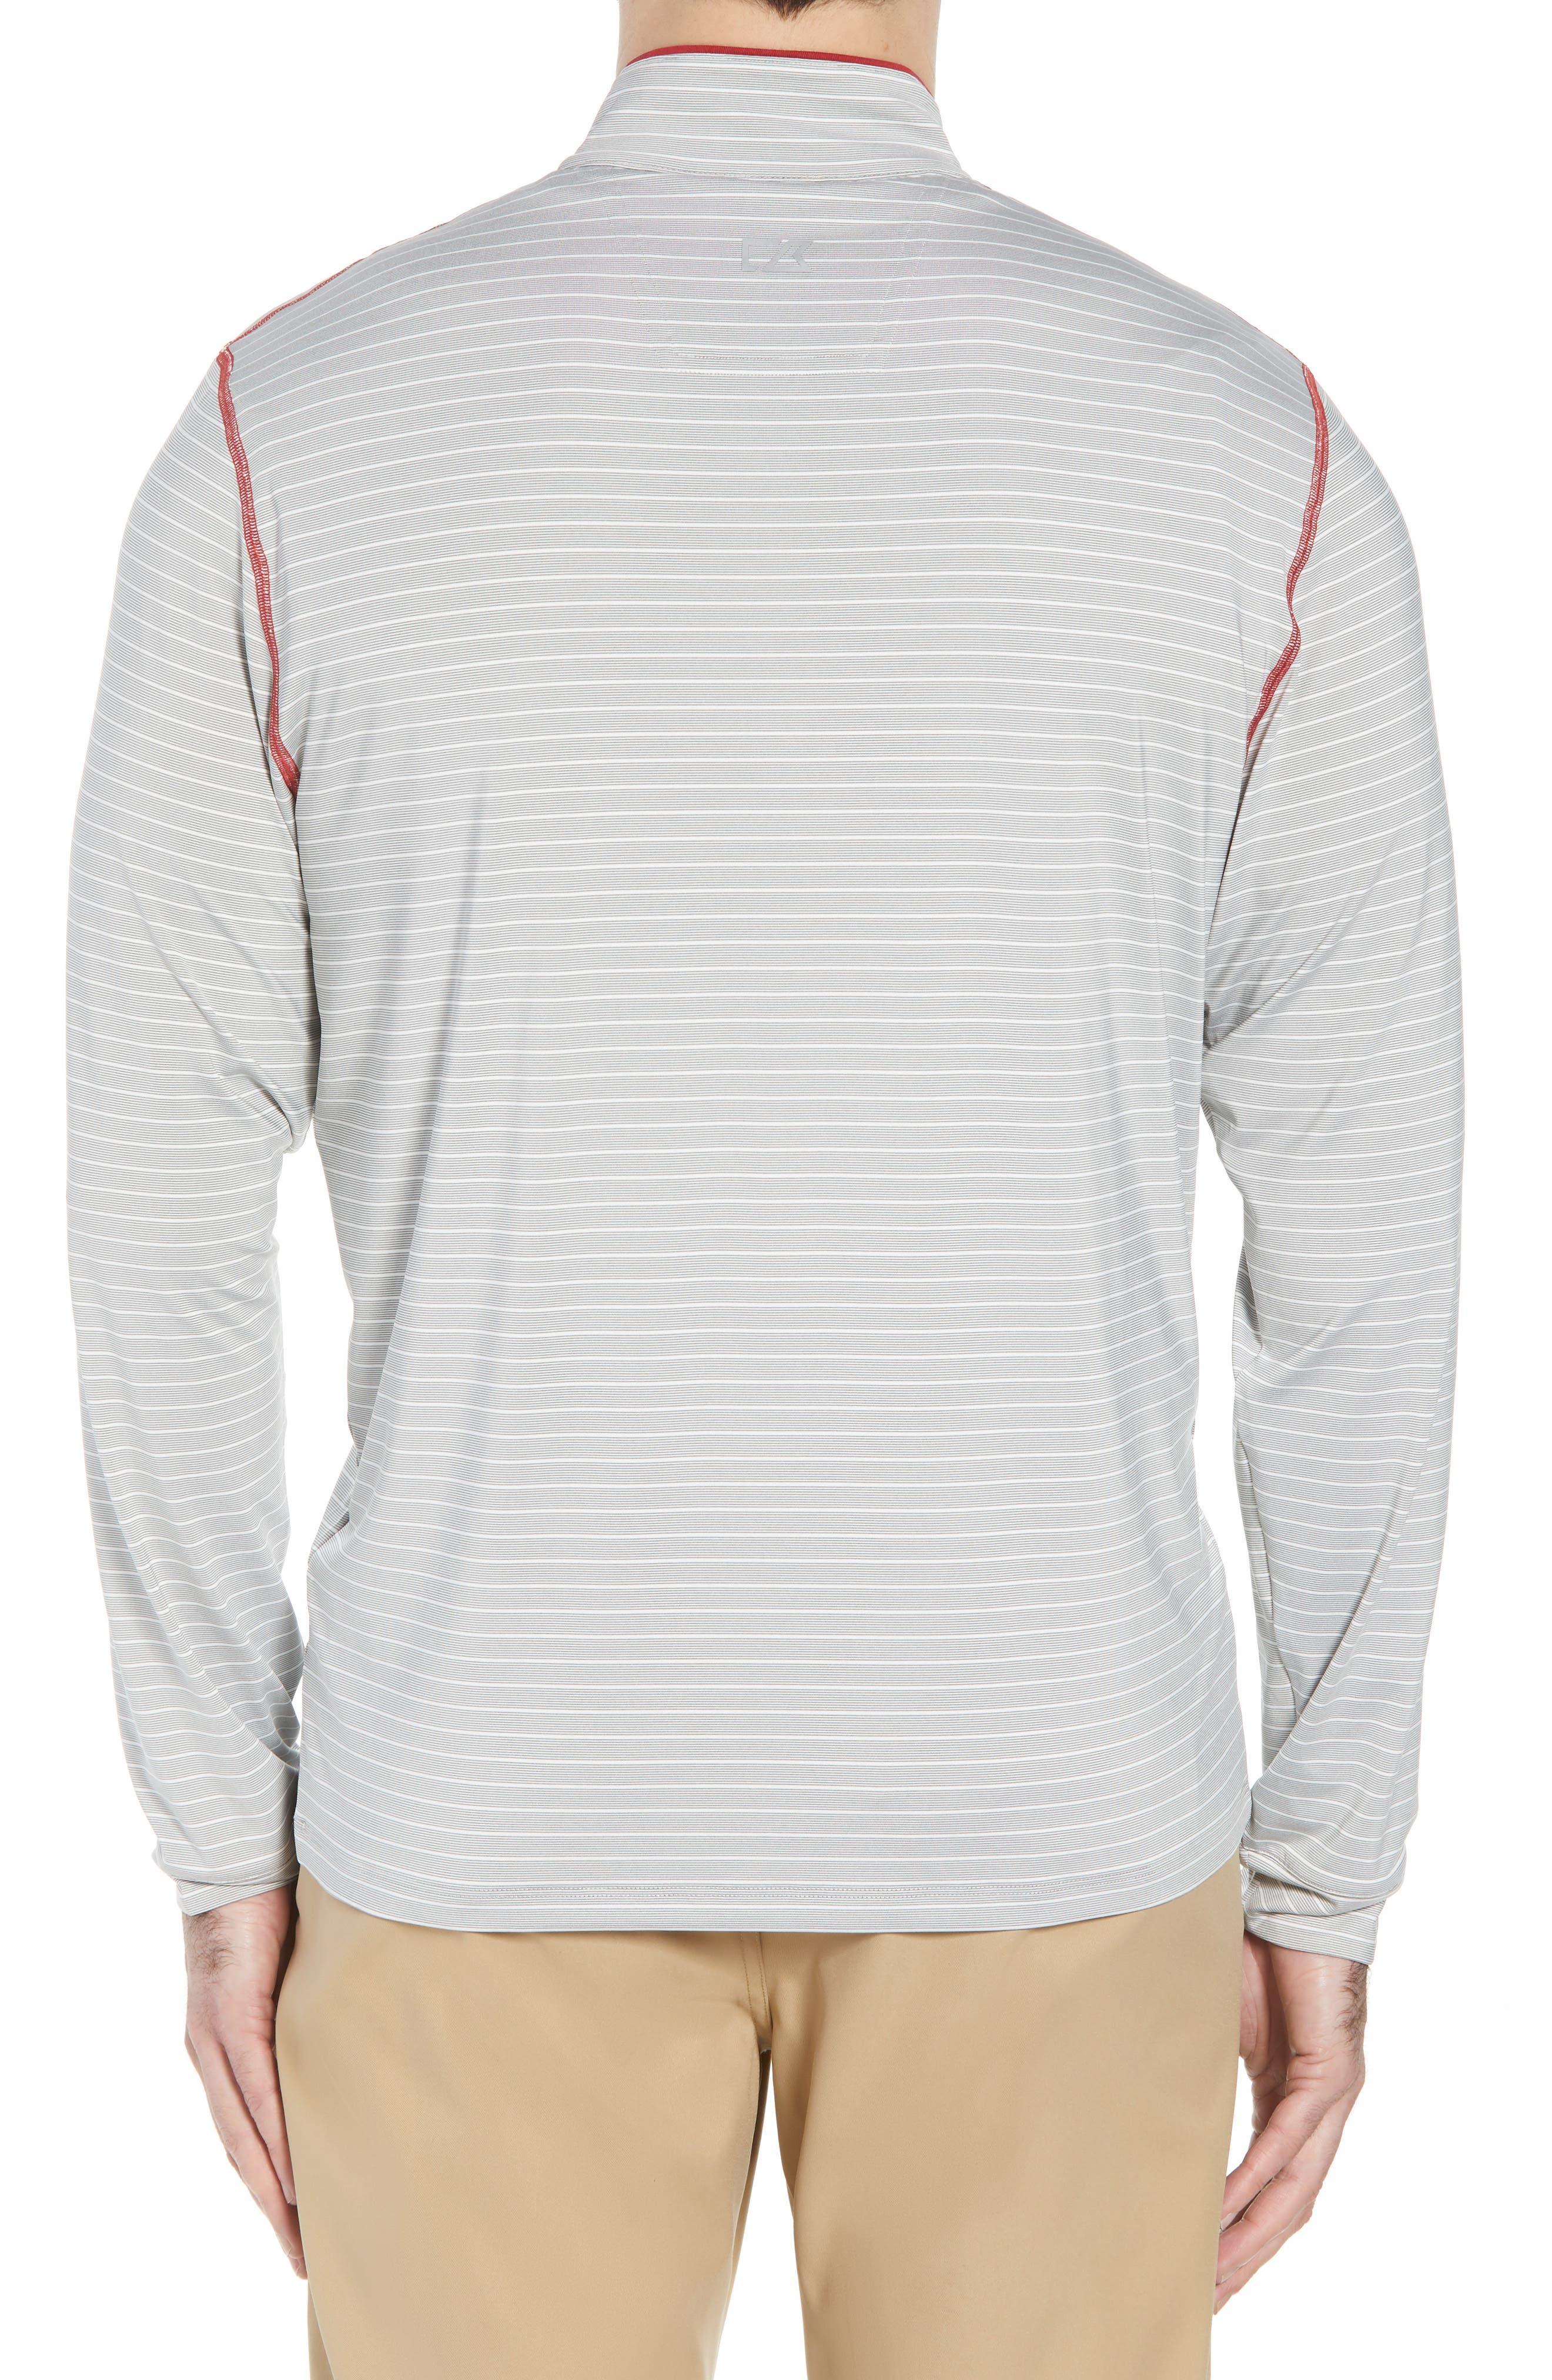 Meridian - San Francisco 49ers Regular Fit Half Zip Pullover,                             Alternate thumbnail 2, color,                             RED